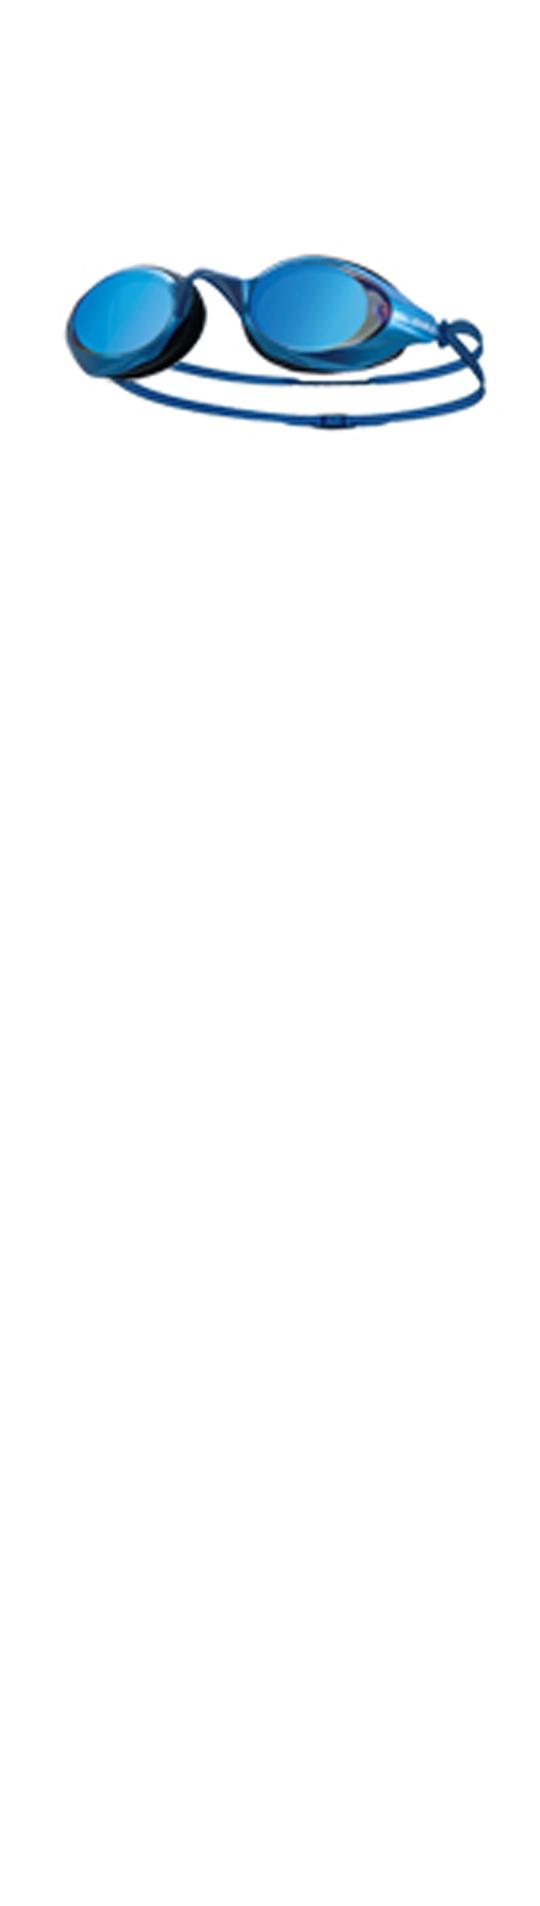 SABLE 100MT平光泳鏡 任選賣場 藍@100MT-02@